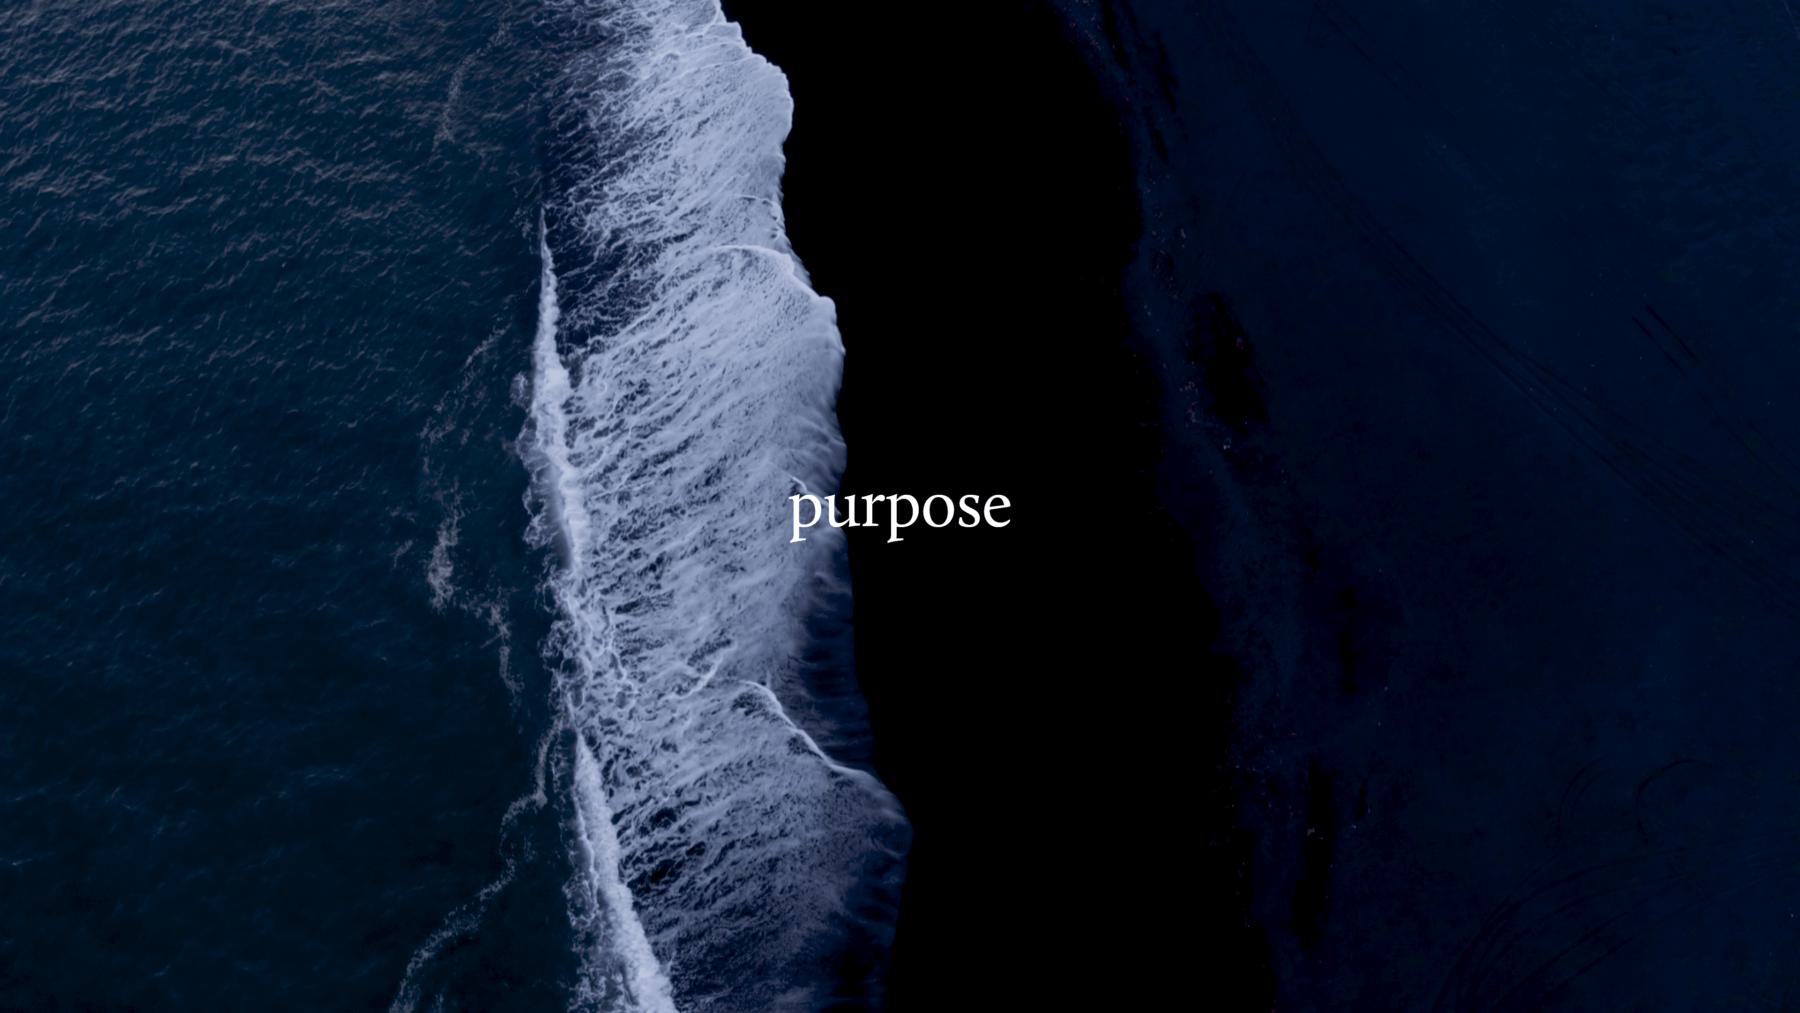 Sermon Series Ideas #8: Purpose